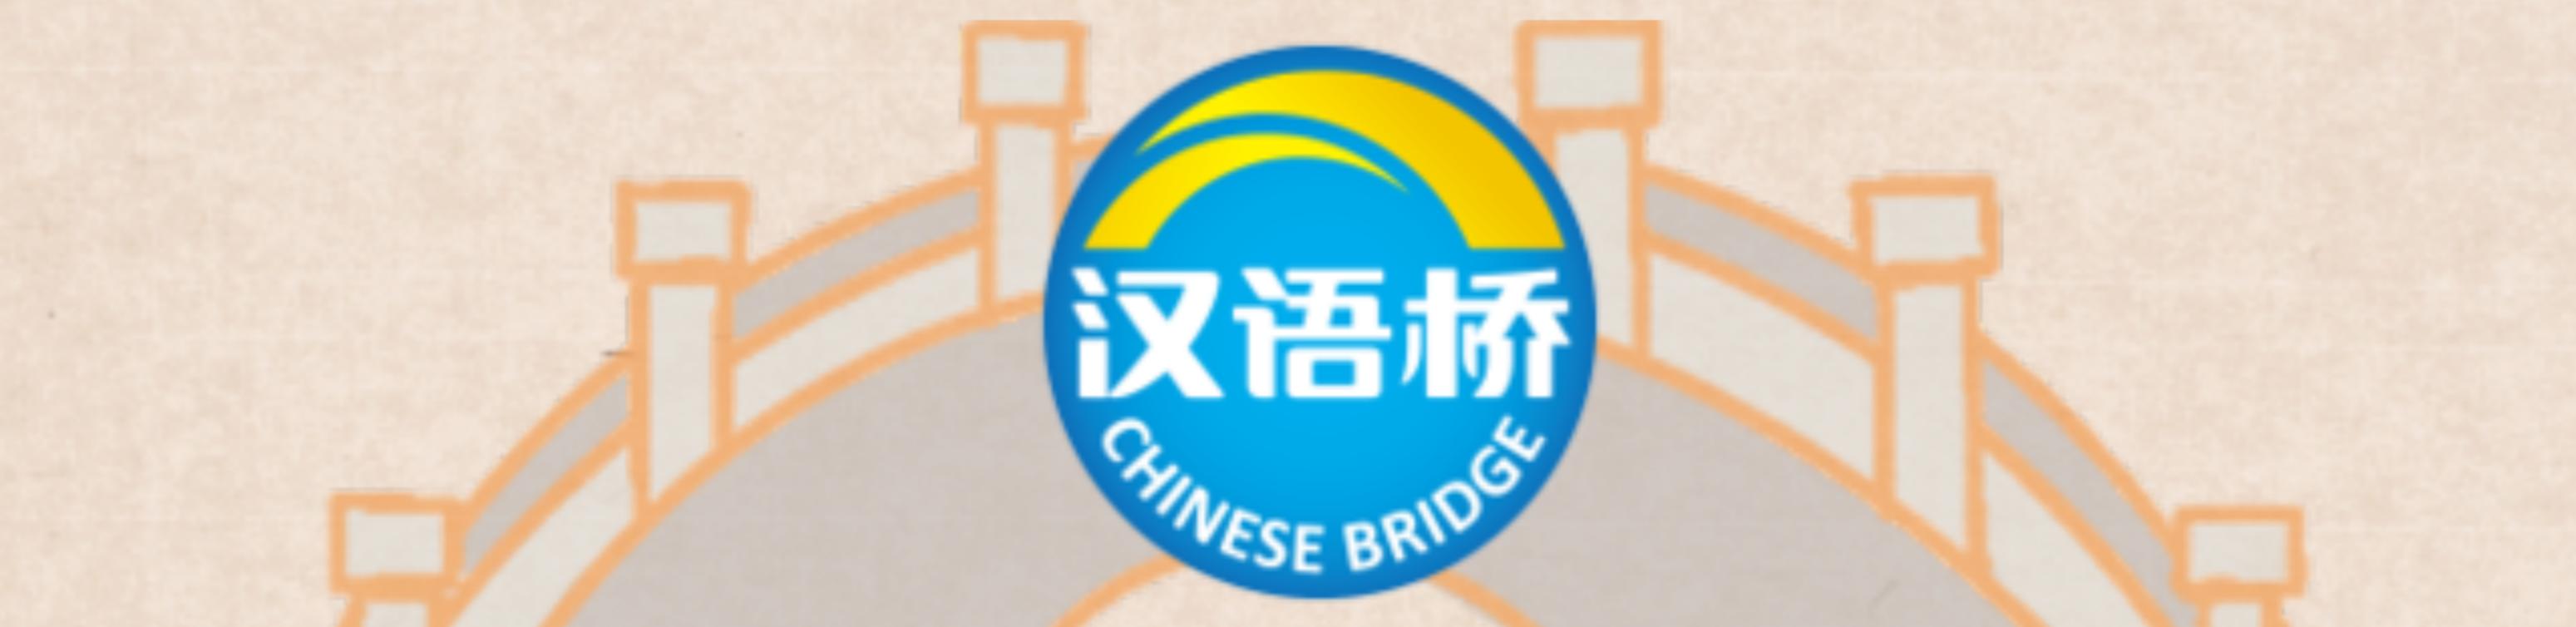 Concurso Puente a China 2021